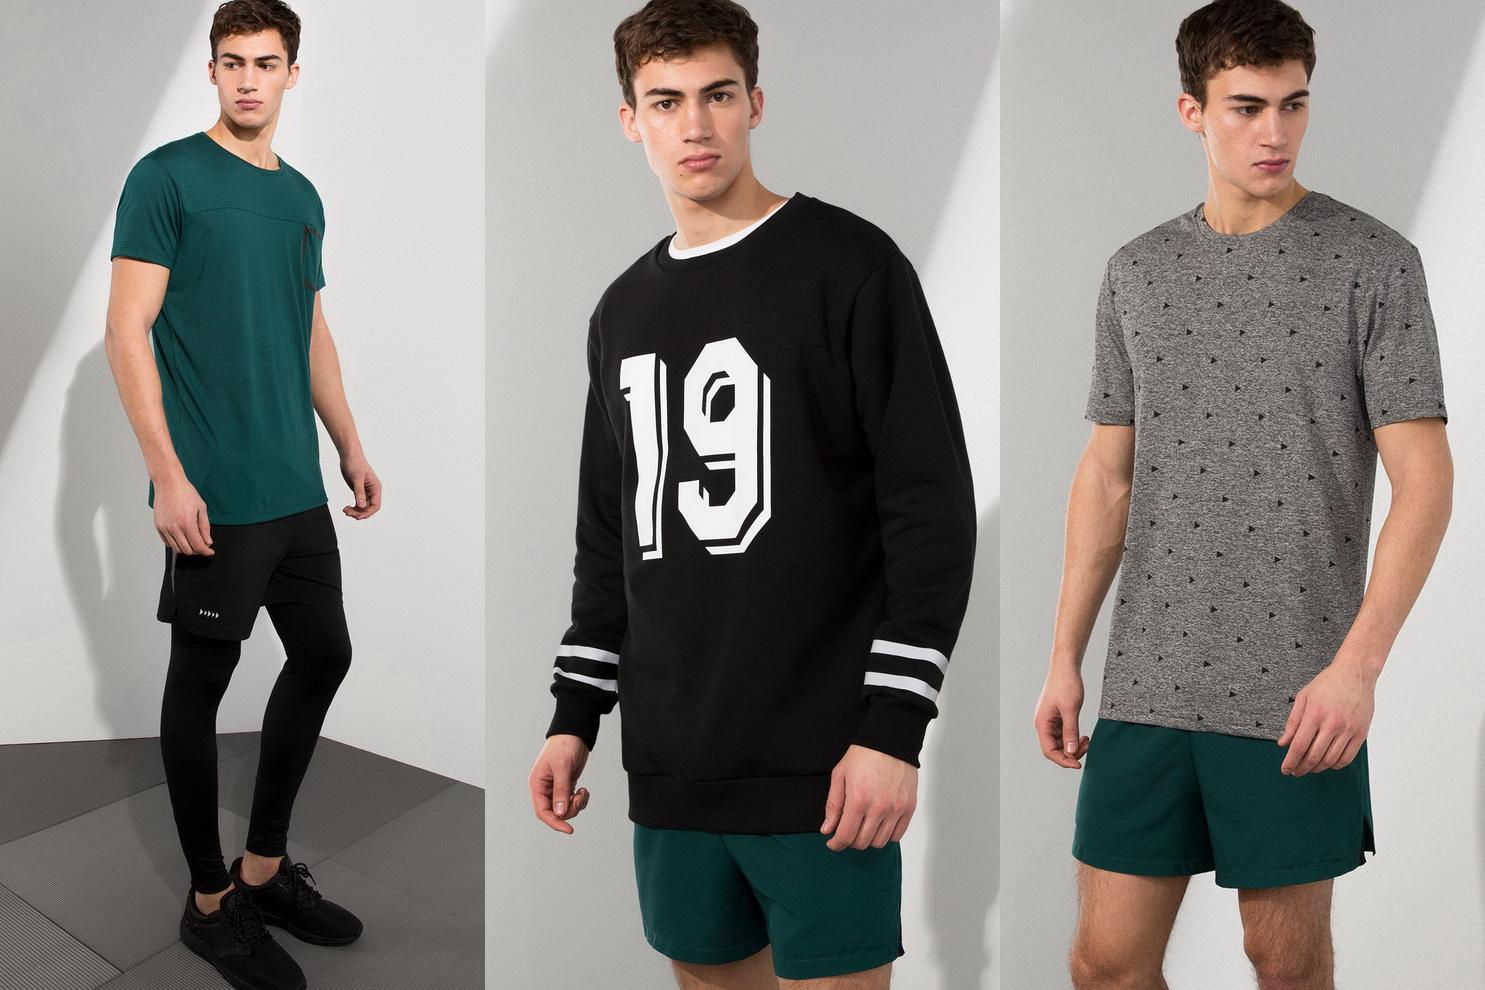 64b798ce418f Блог BegetNews  мужская мода, тенденции, статьи, фото, ссылки  Pull ...